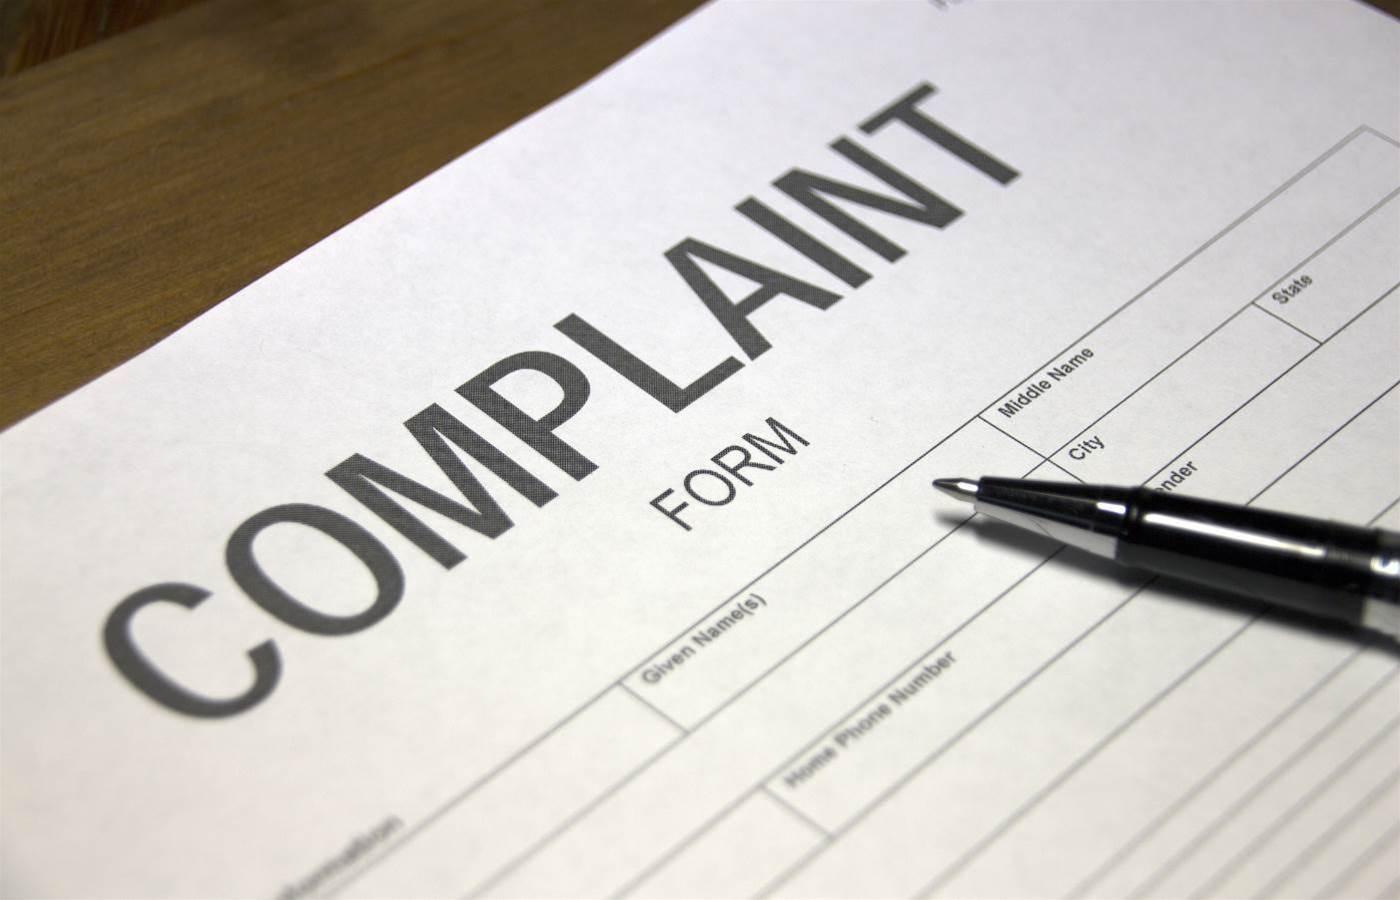 Telco complaints rose 6 percent across 17/18 says TIO